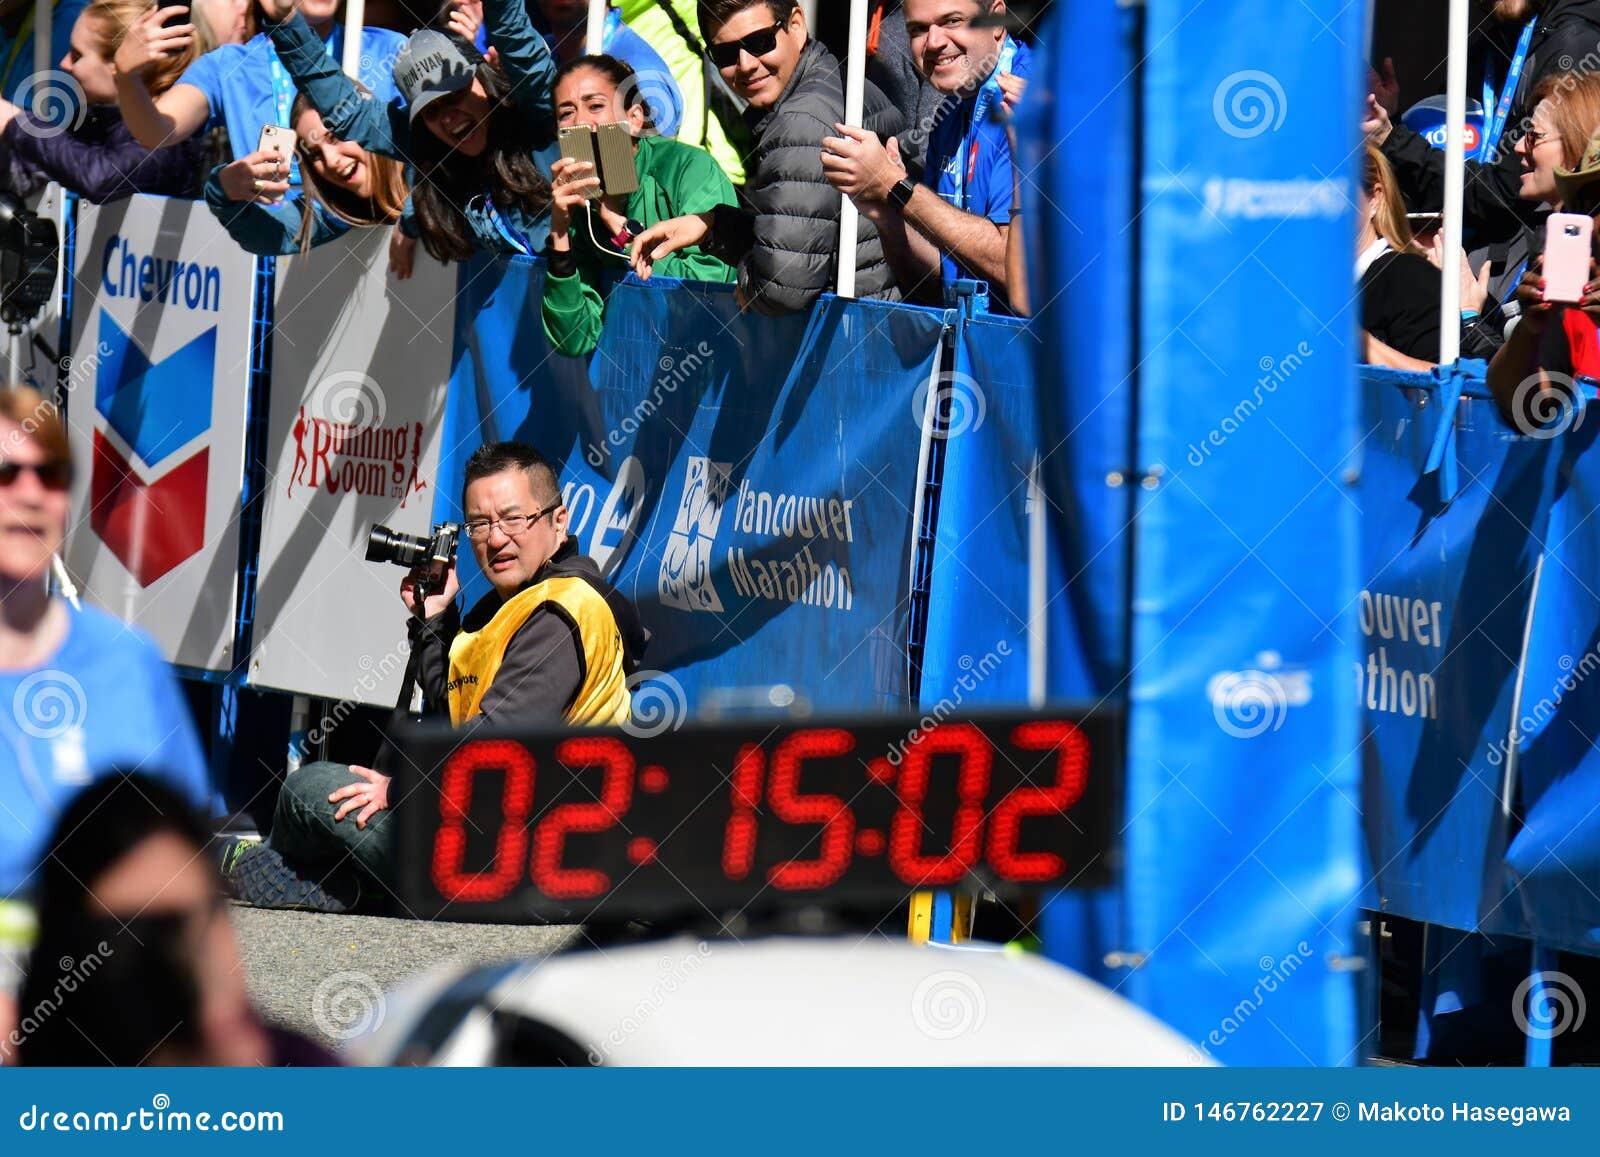 Mr.Yuki Kawauchi won 1st place at Vancouver marathon. Time is 02:15:01.0